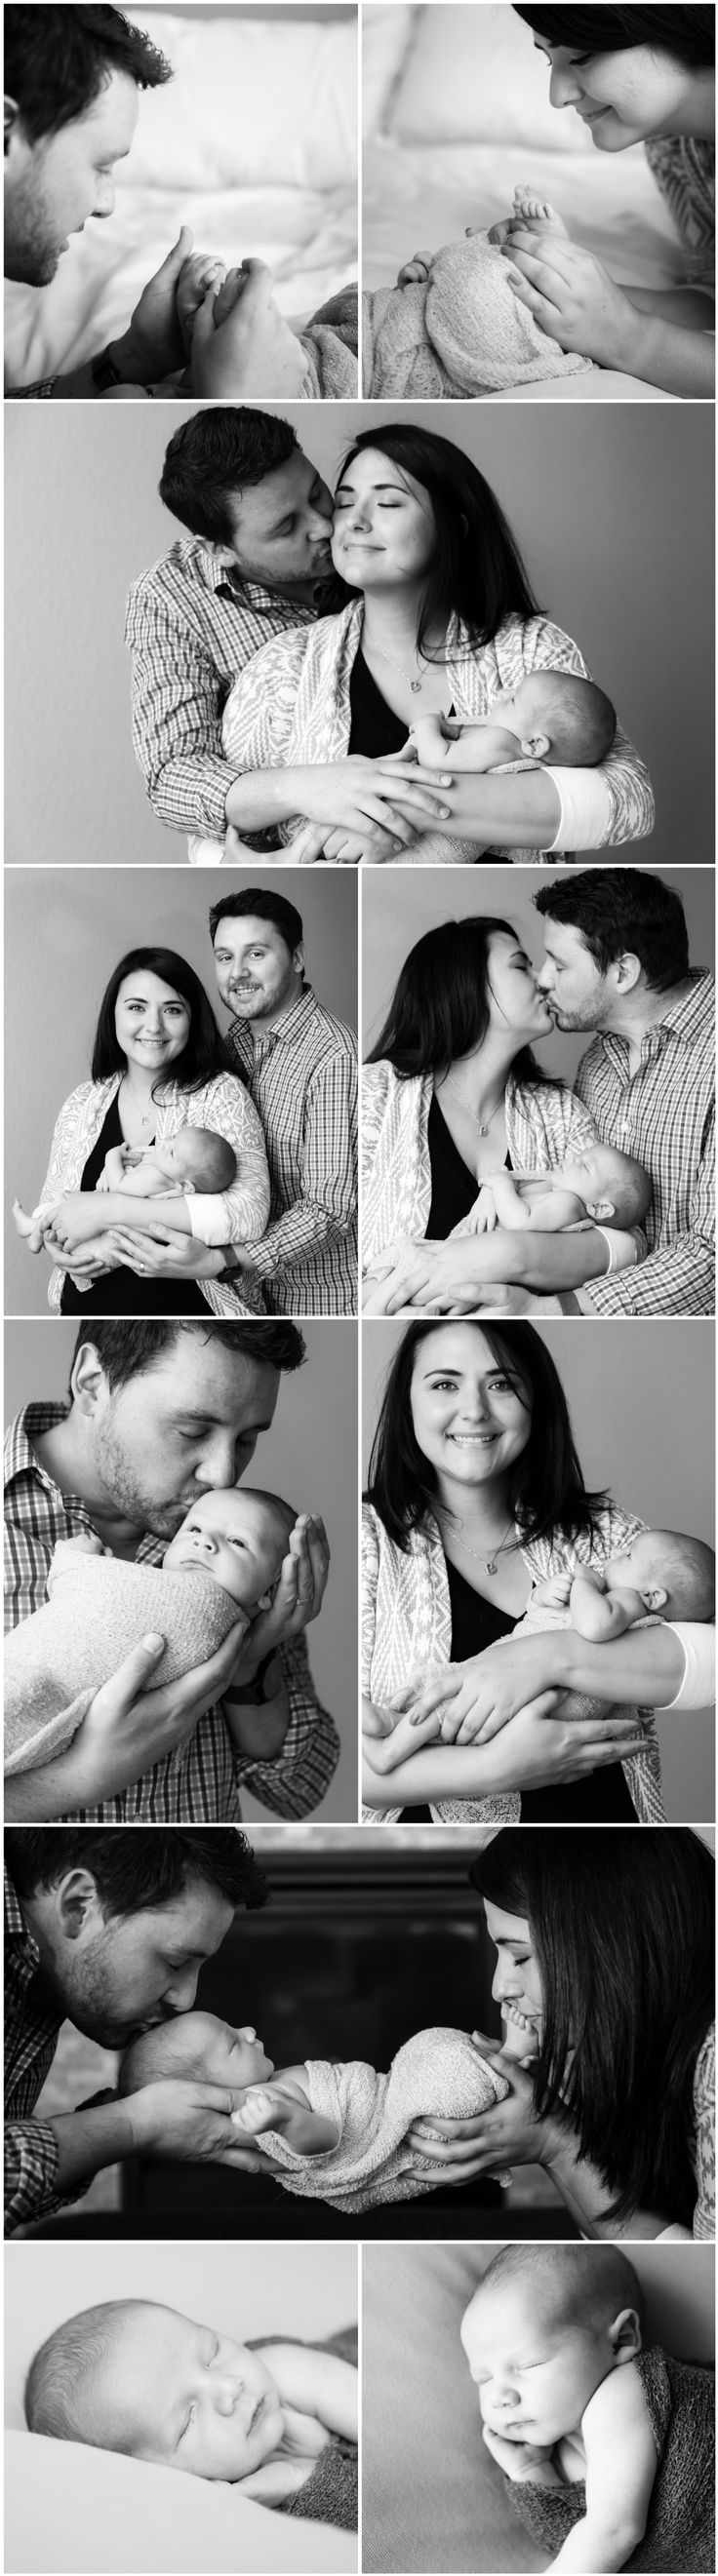 Black and White Newborn Photography Ideas and Inspiration   Newborn Poses   Denver Newborn Photographers   Newborn Portraits